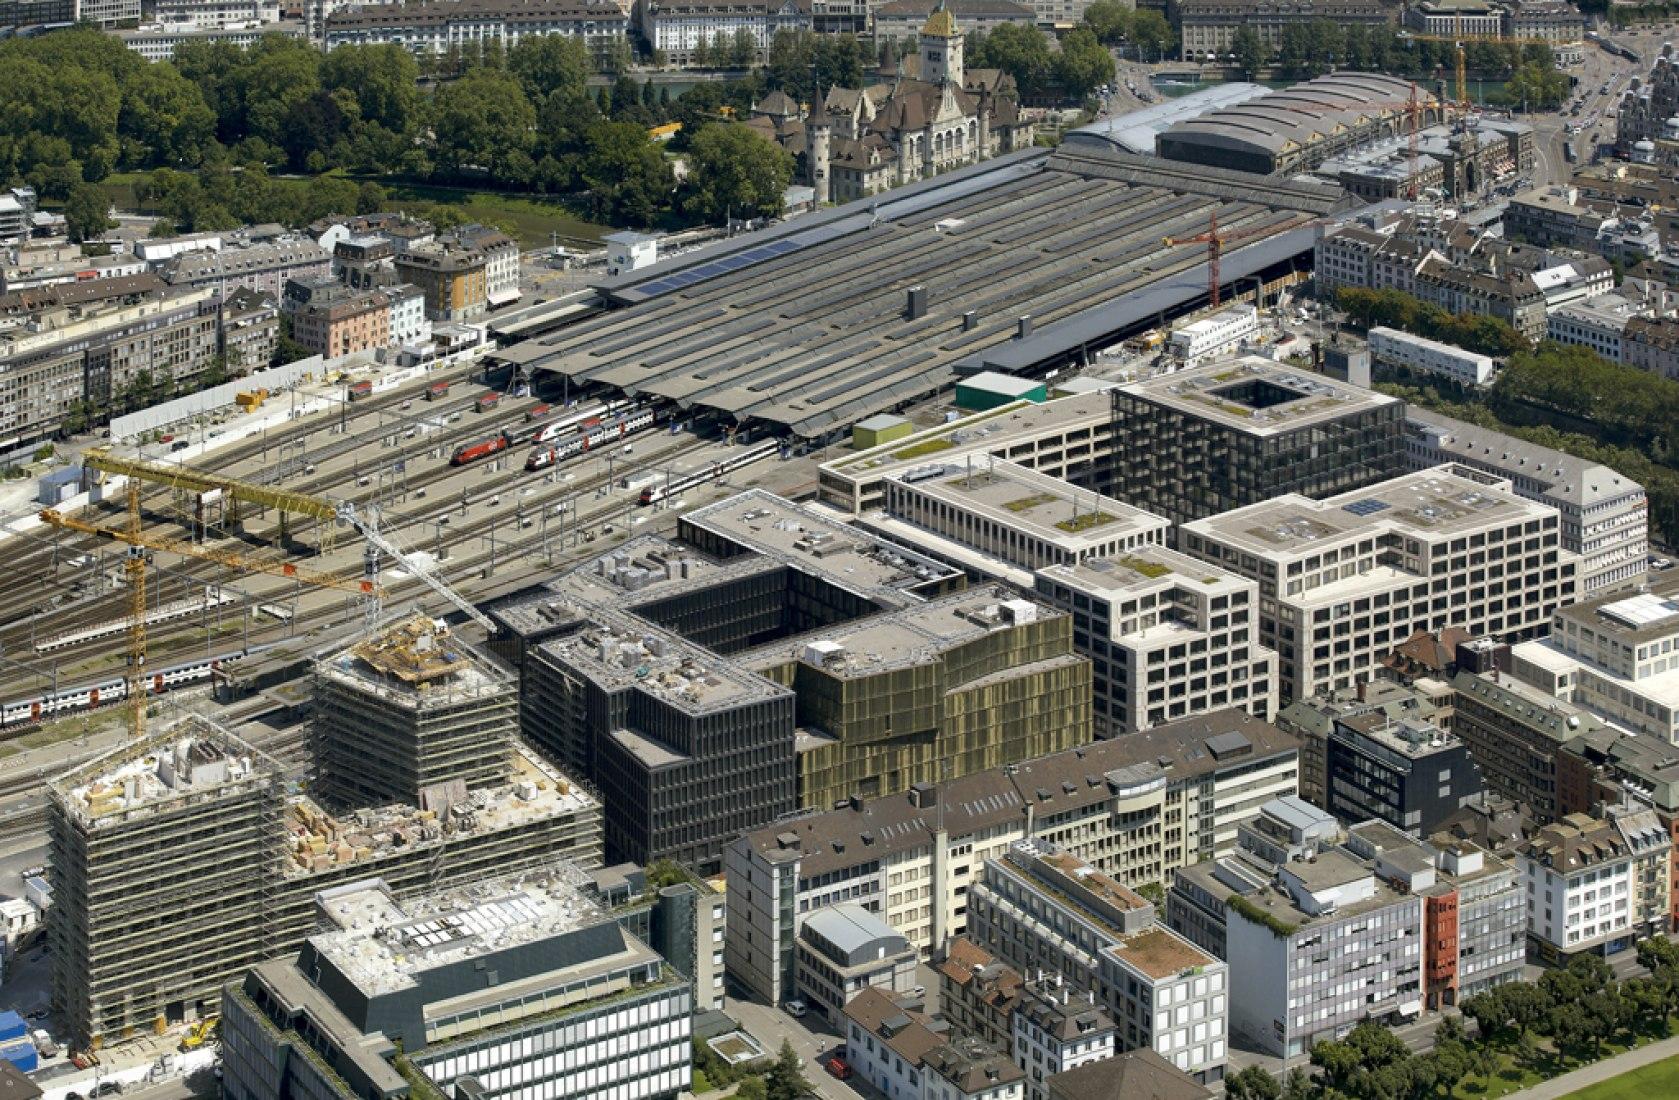 Vista aérea de Europaallee. Eisgasse House, Europaallee 21, por Max Dudler. Fotografía © Stefan Müller